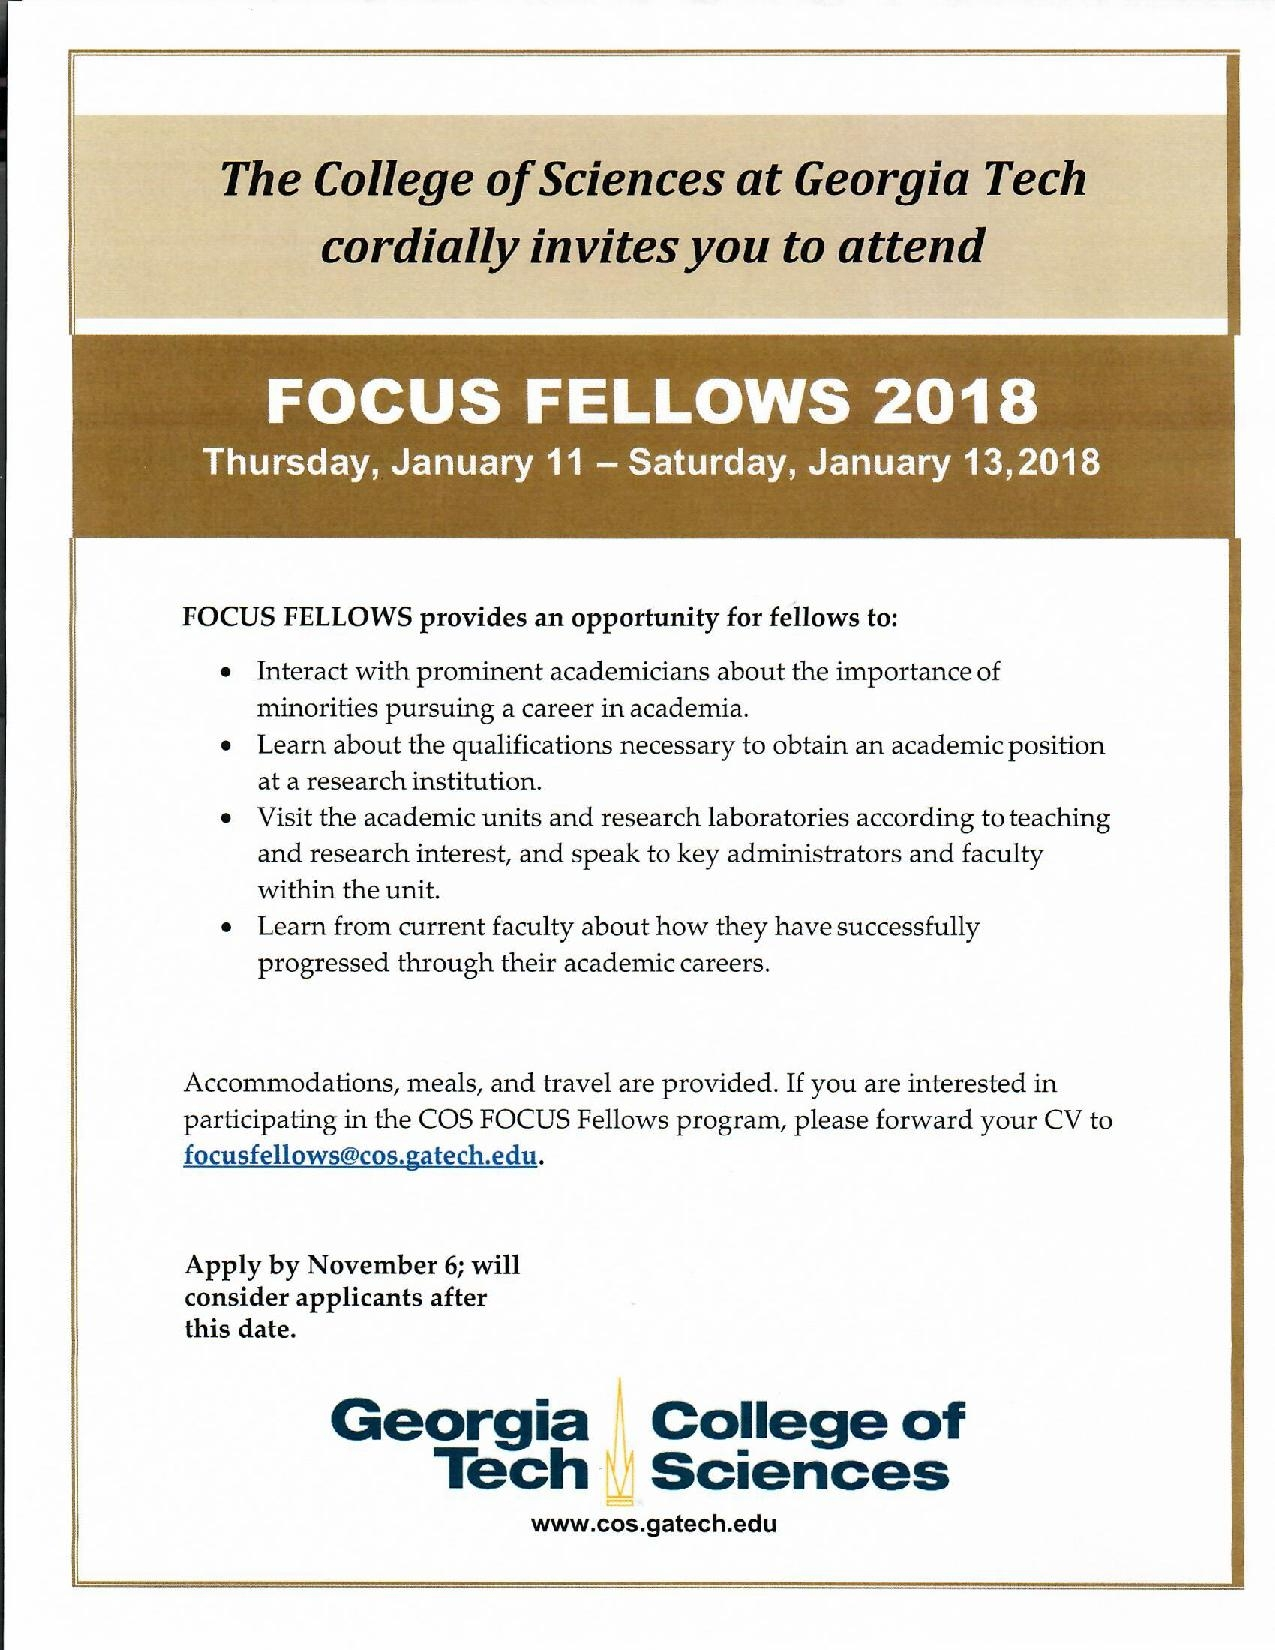 2018 Focus Fellow Georgia Tech Application Deadline November 6